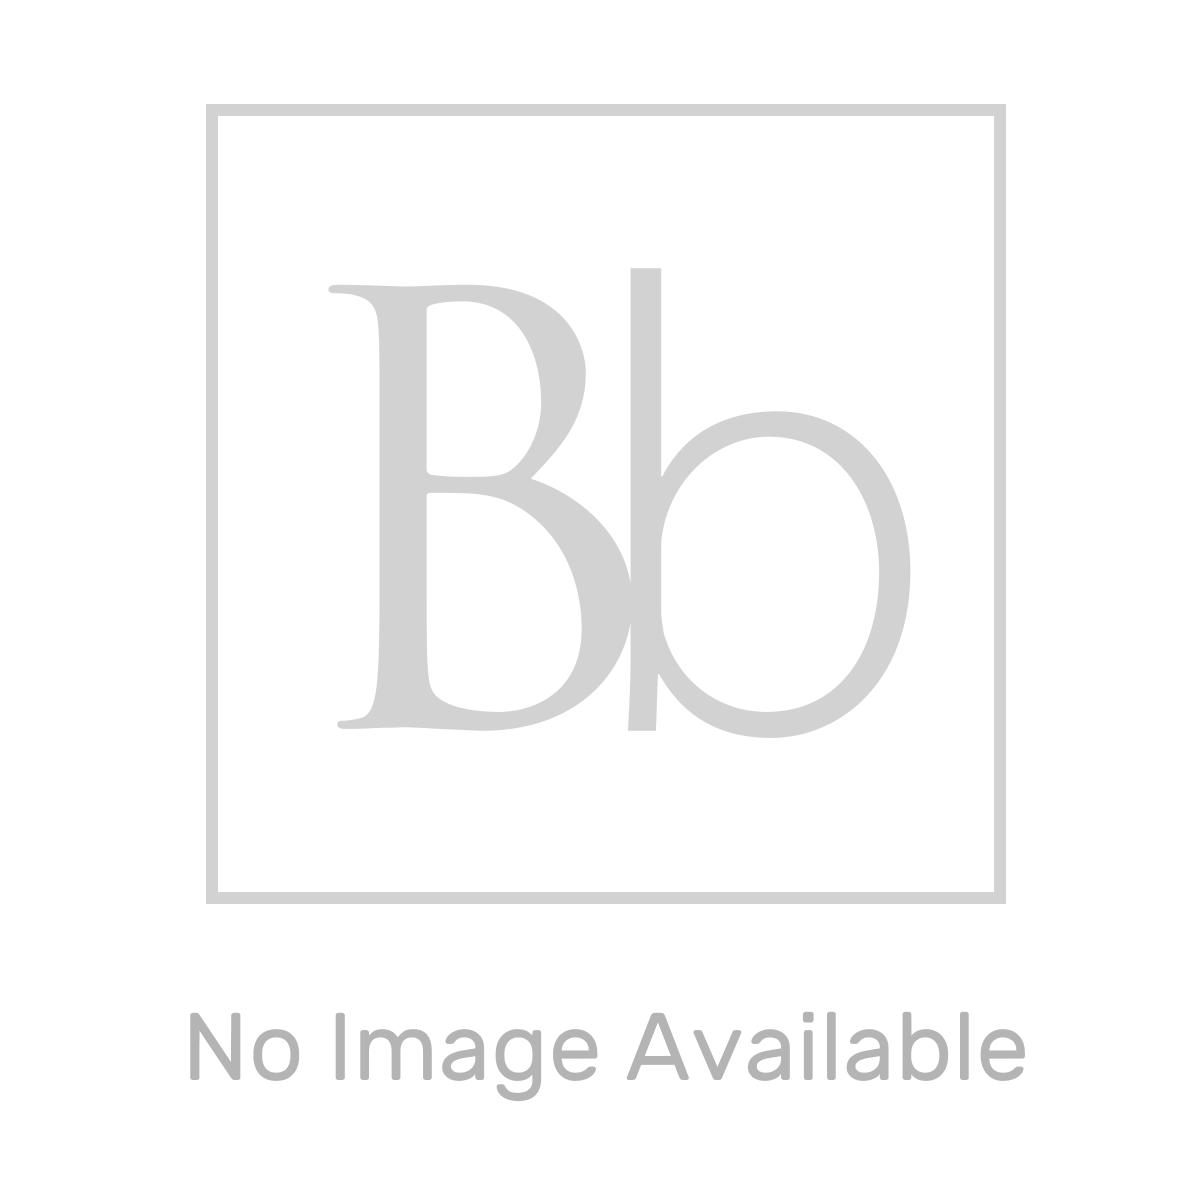 RAK Washington Greige Vanity Unit with Grey Countertop 600mm Measurements